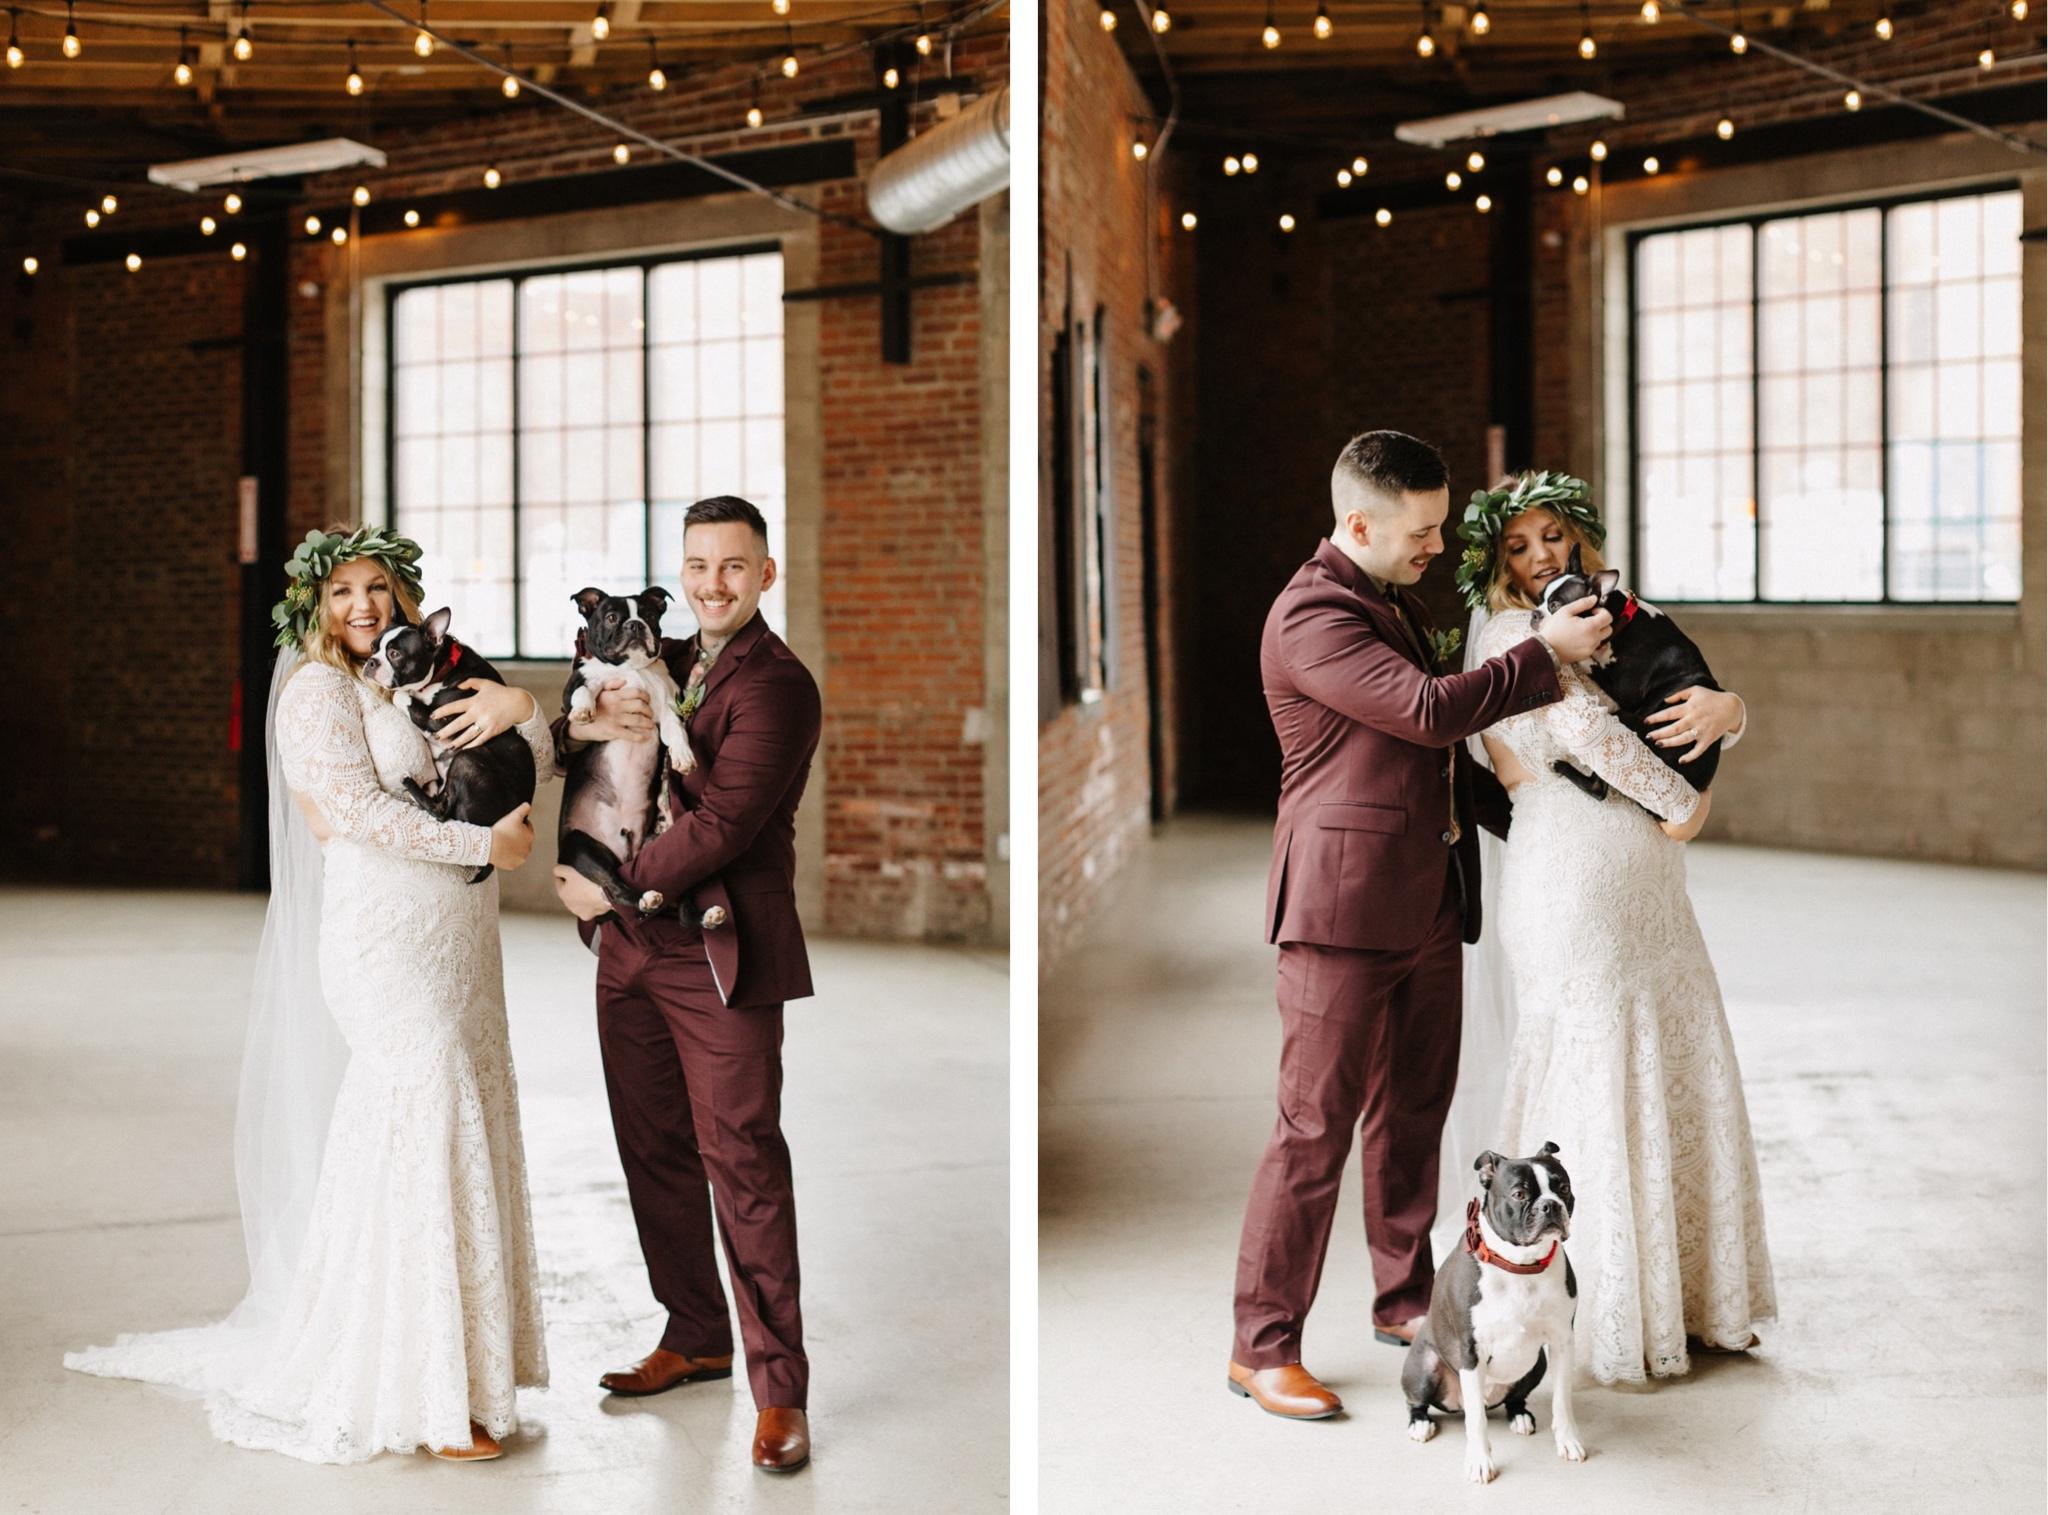 21_19-03-30 Caylen and Max Wedding Previews-43_19-03-30 Caylen and Max Wedding Previews-39.jpg